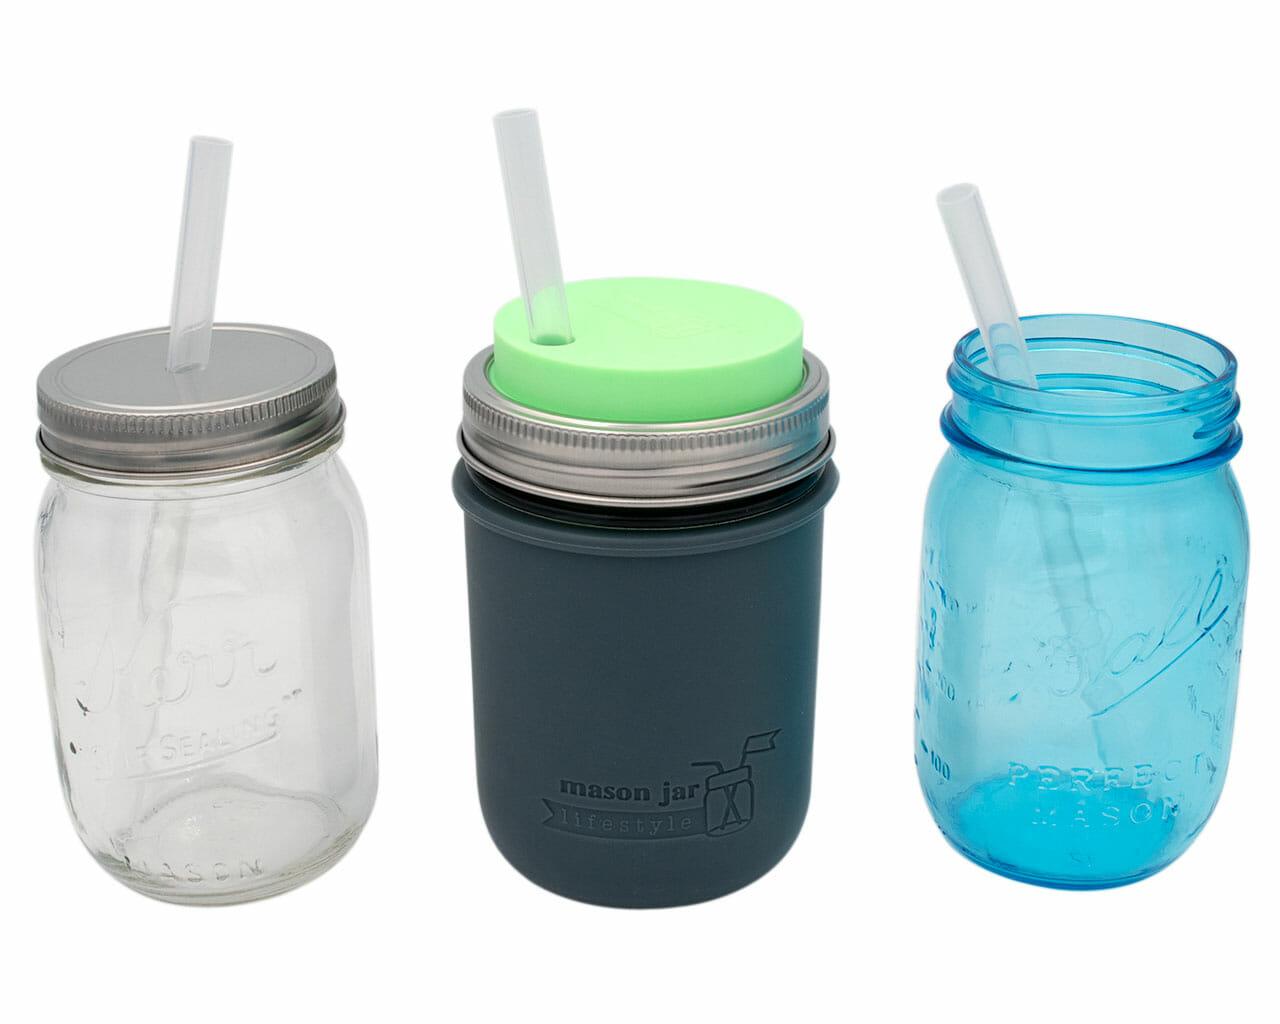 Medium Silicone Reusable Straws For Pint Mason Jars 8 Pack